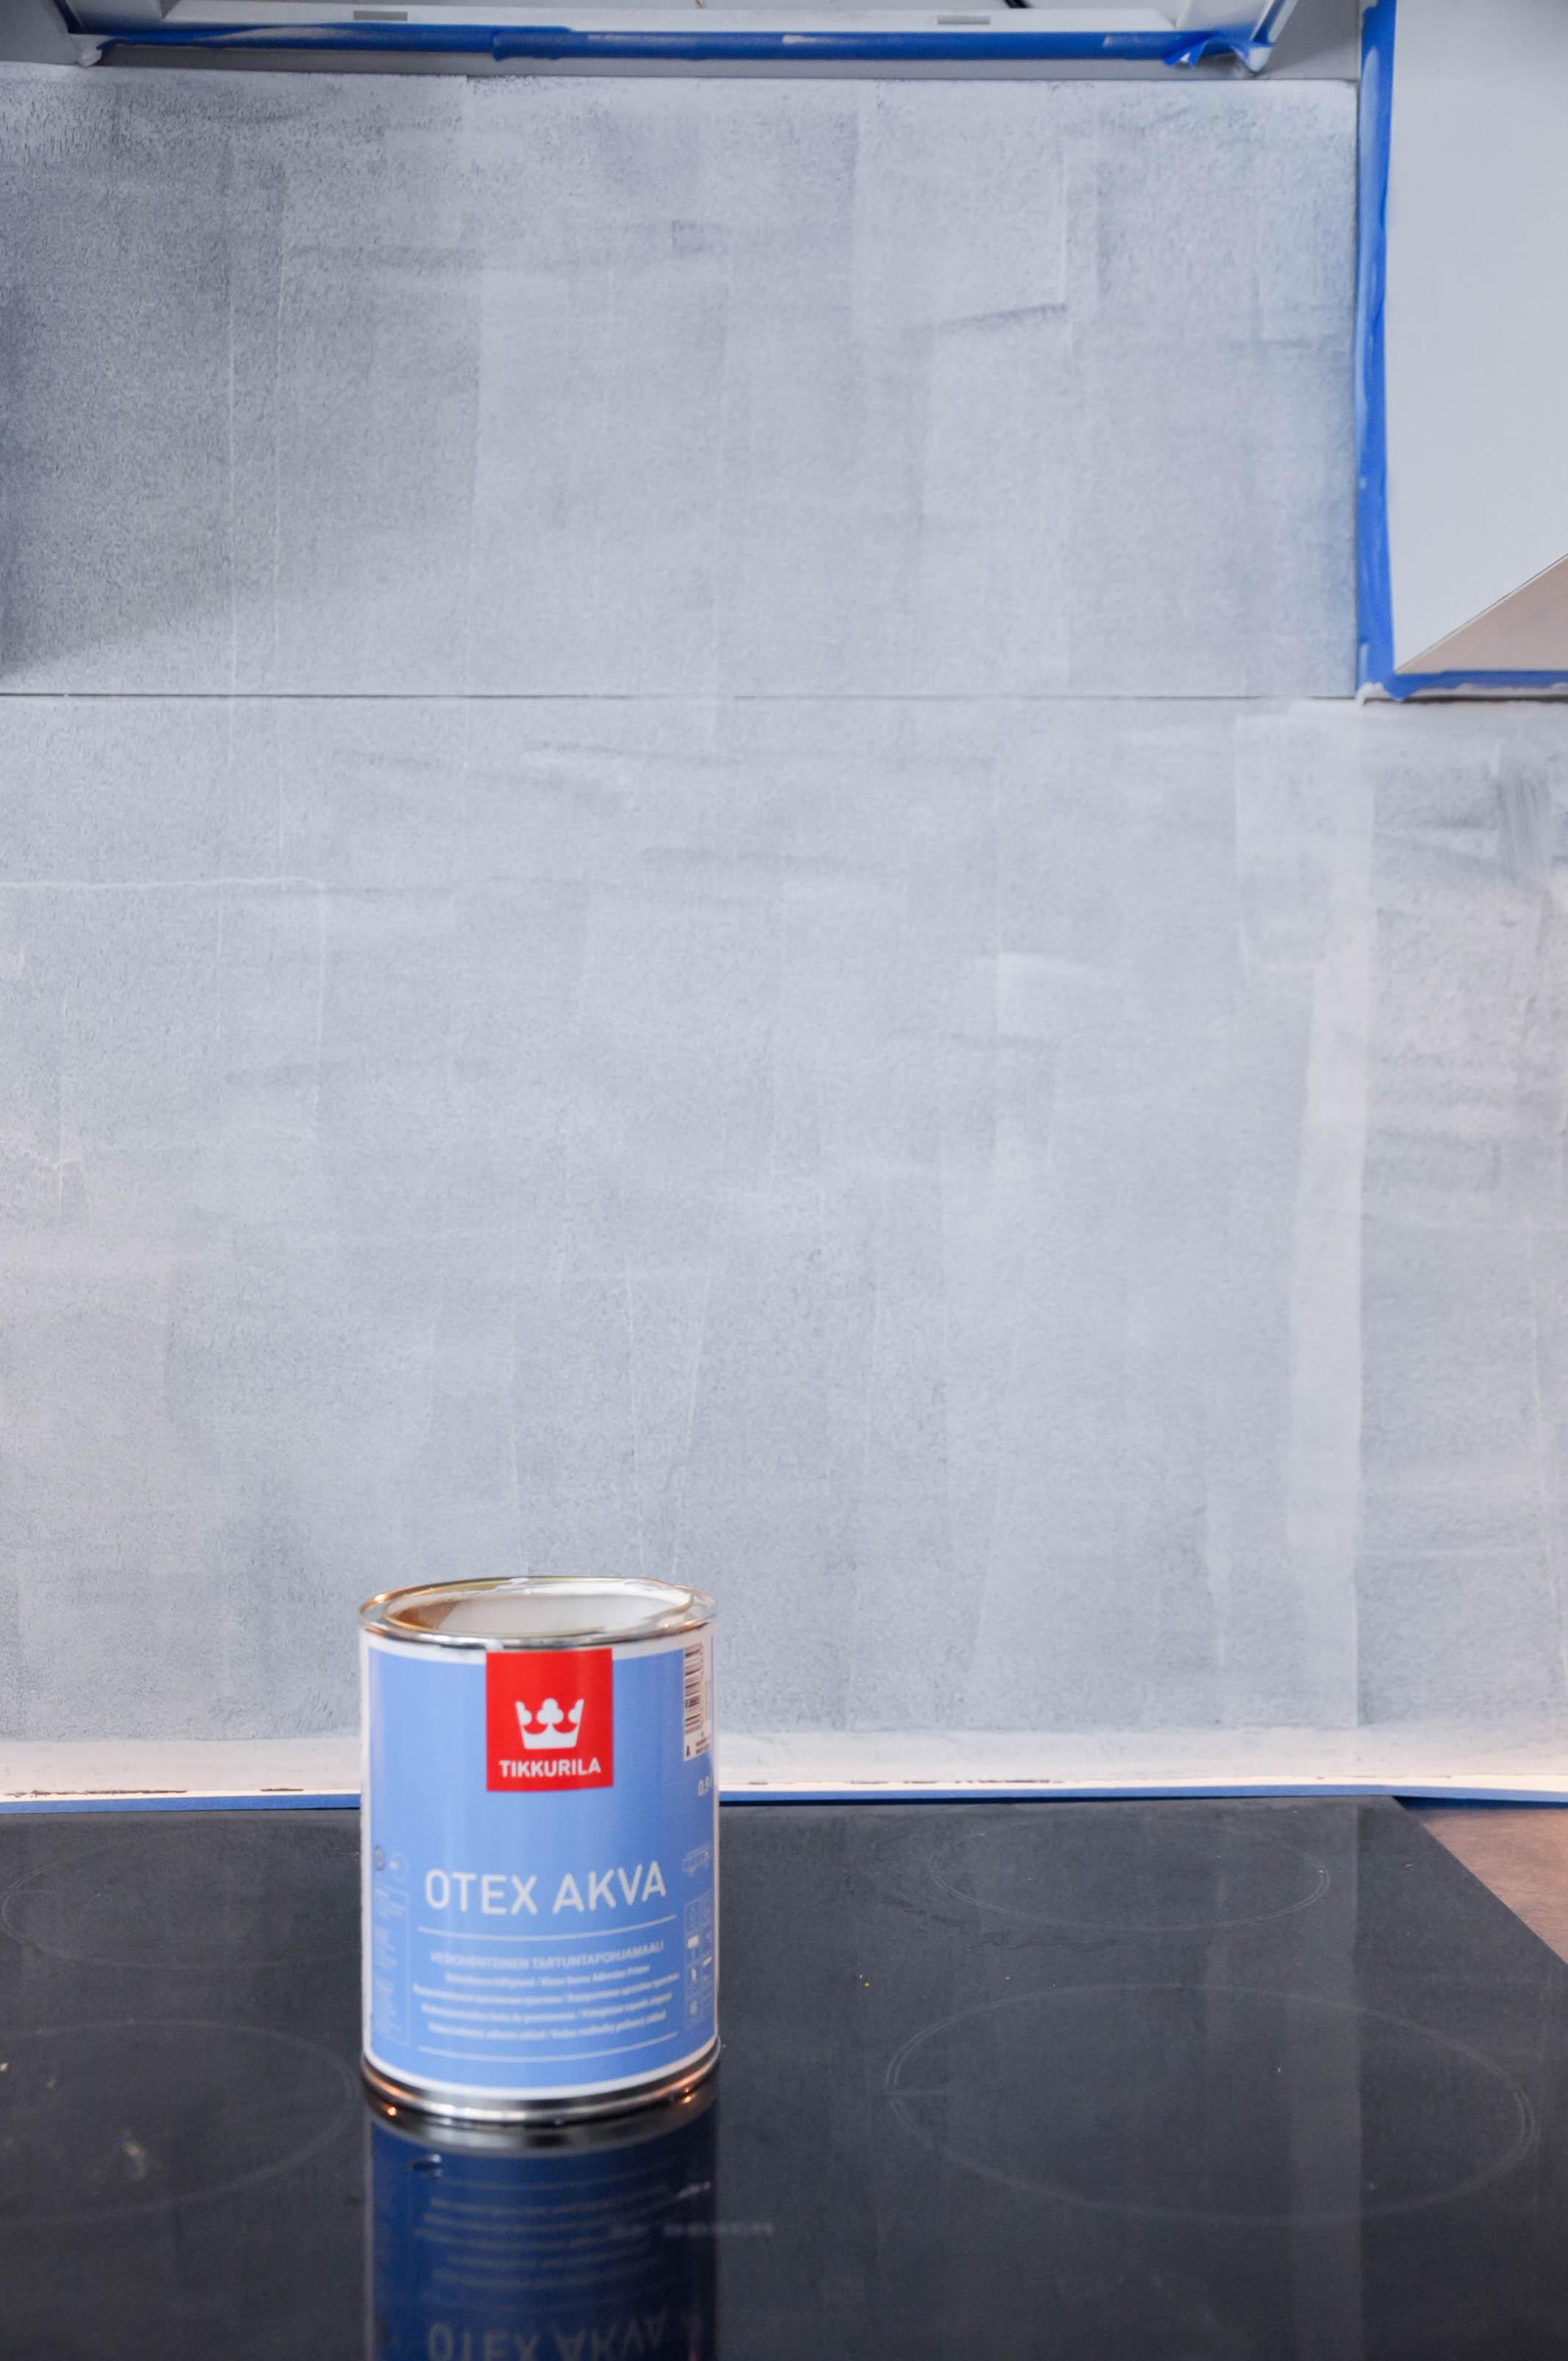 jak pomalować kafle tikkurila otex akva